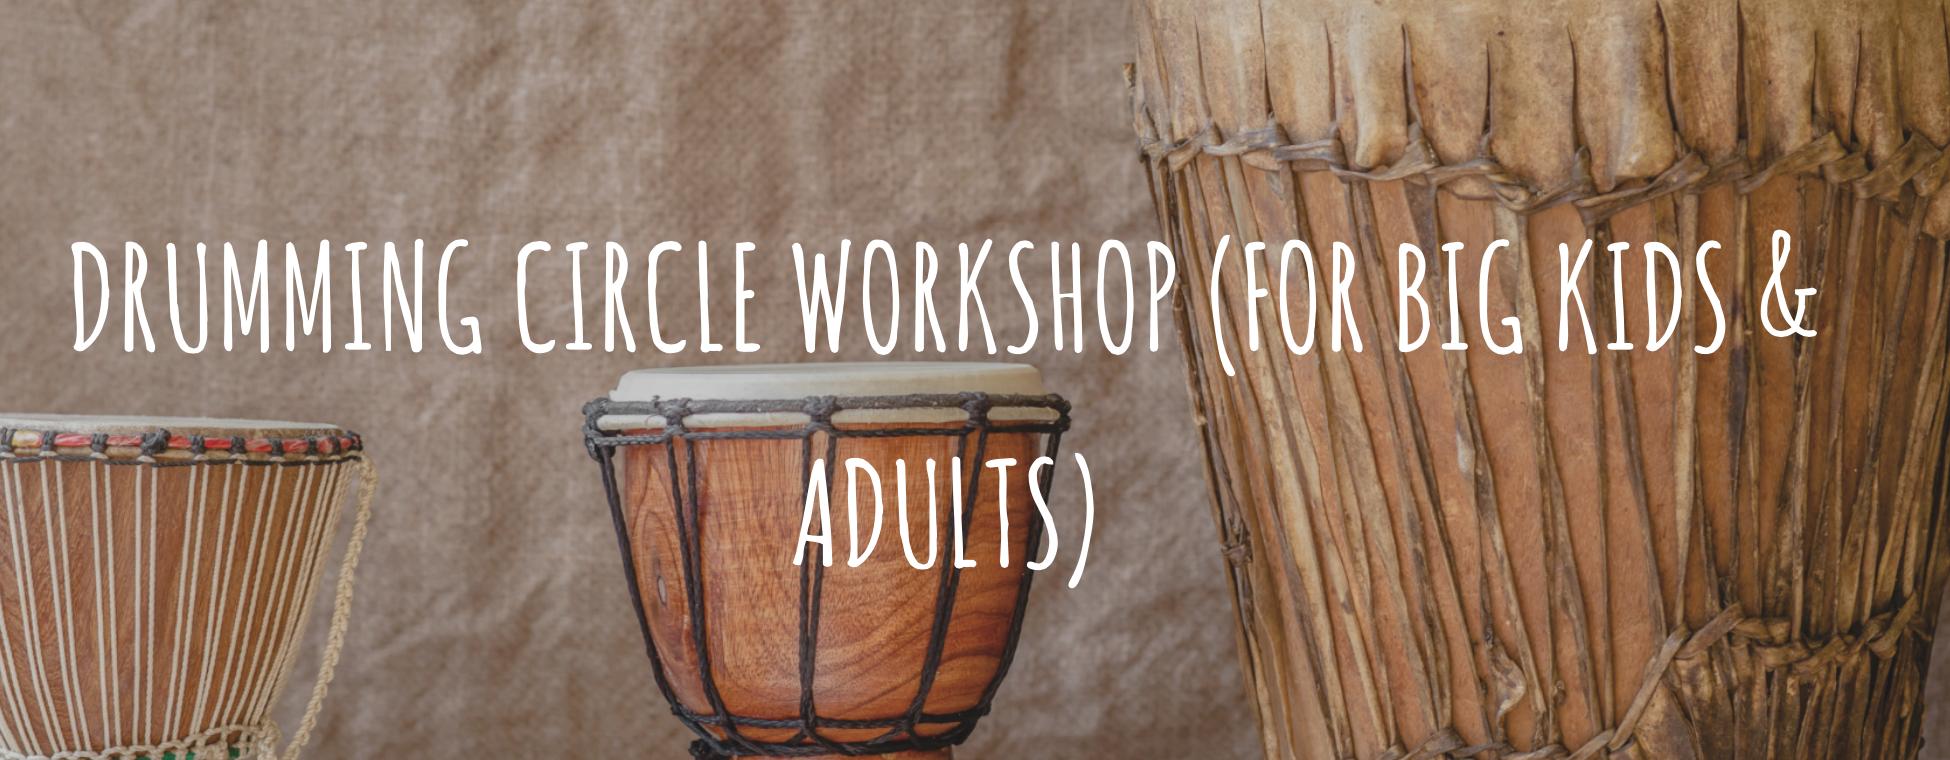 Drumming circle Workshop